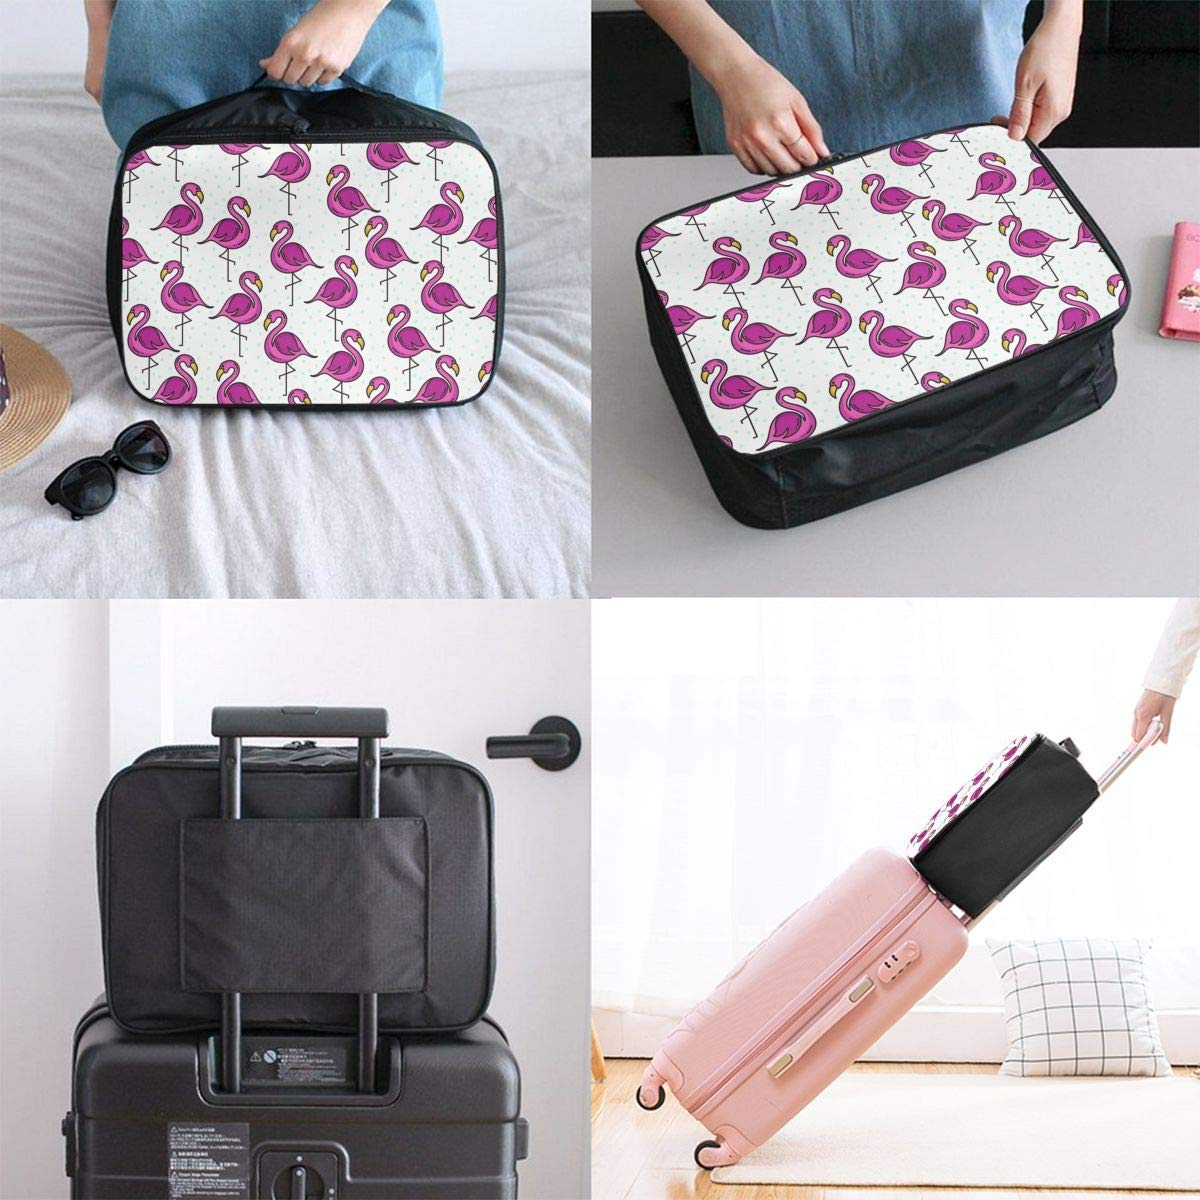 Doodle Flamingo Pattern Luggage Bag Capacity Portable Large Travel Duffel Bag Travel Organizer